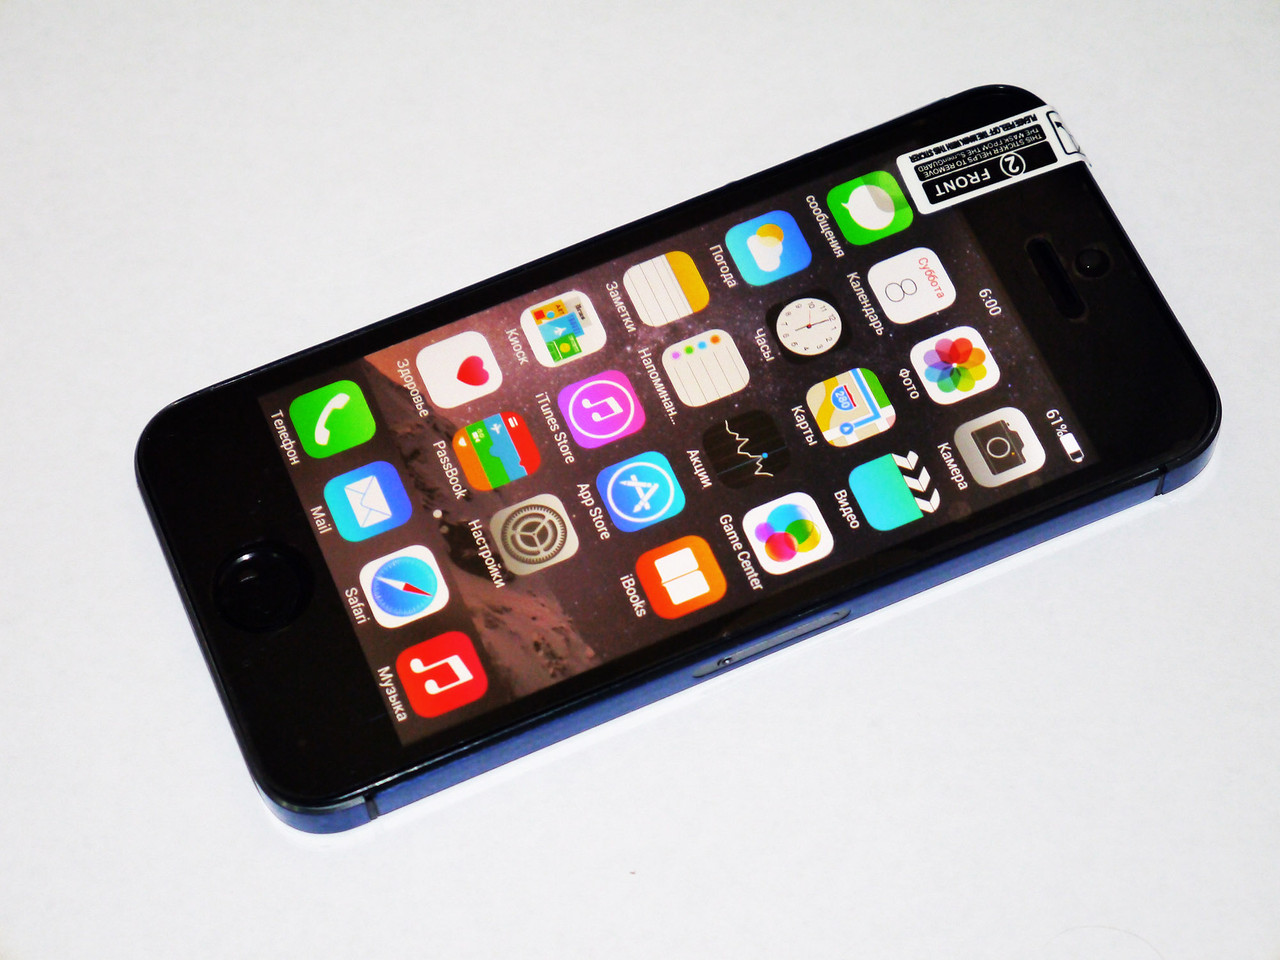 IPhone 5S Android 2Ядра +512RAM +8GB Rom +GPS